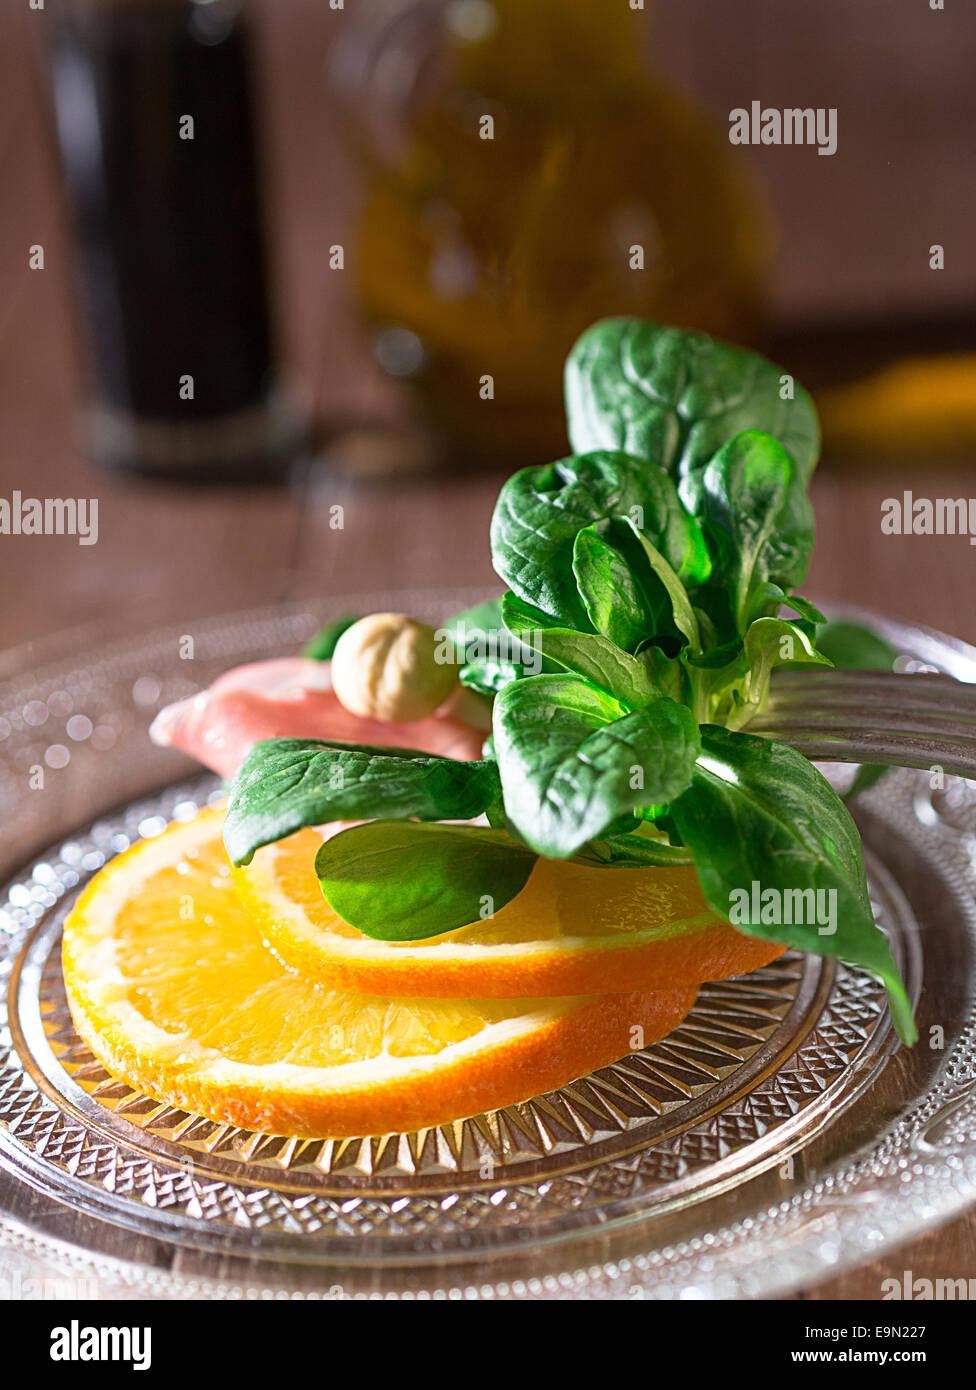 Lamb's lettuce with oranges and ham Stock Photo